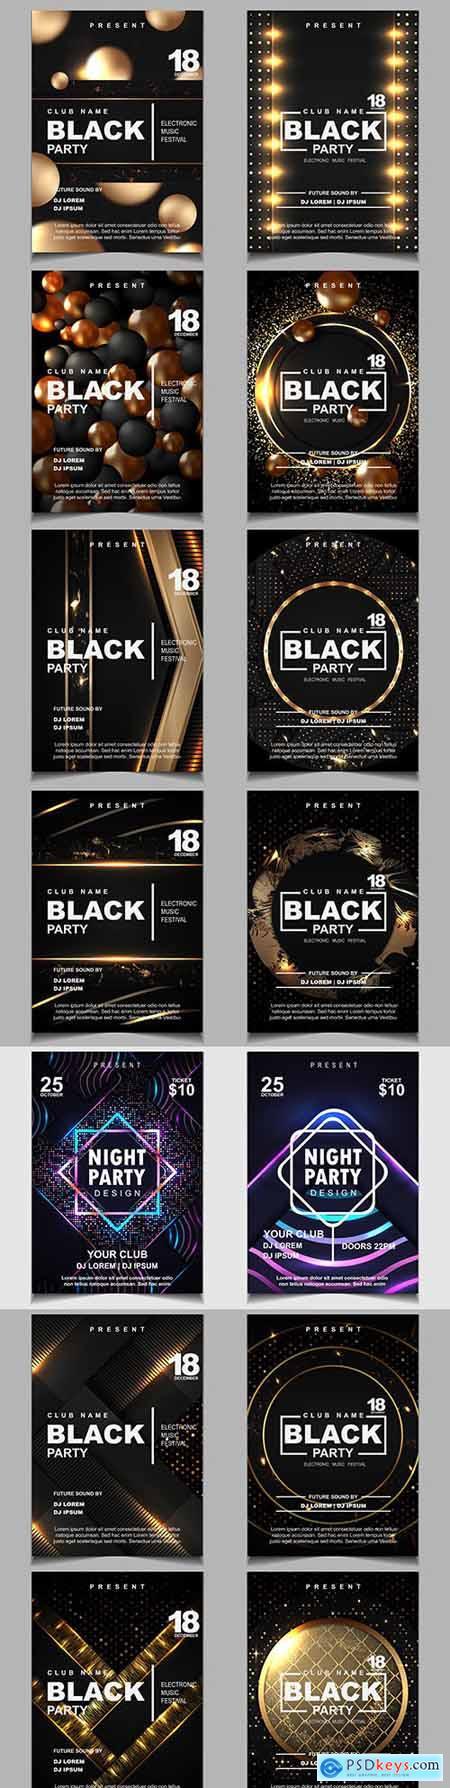 Black and gold nightclub flyer design poster